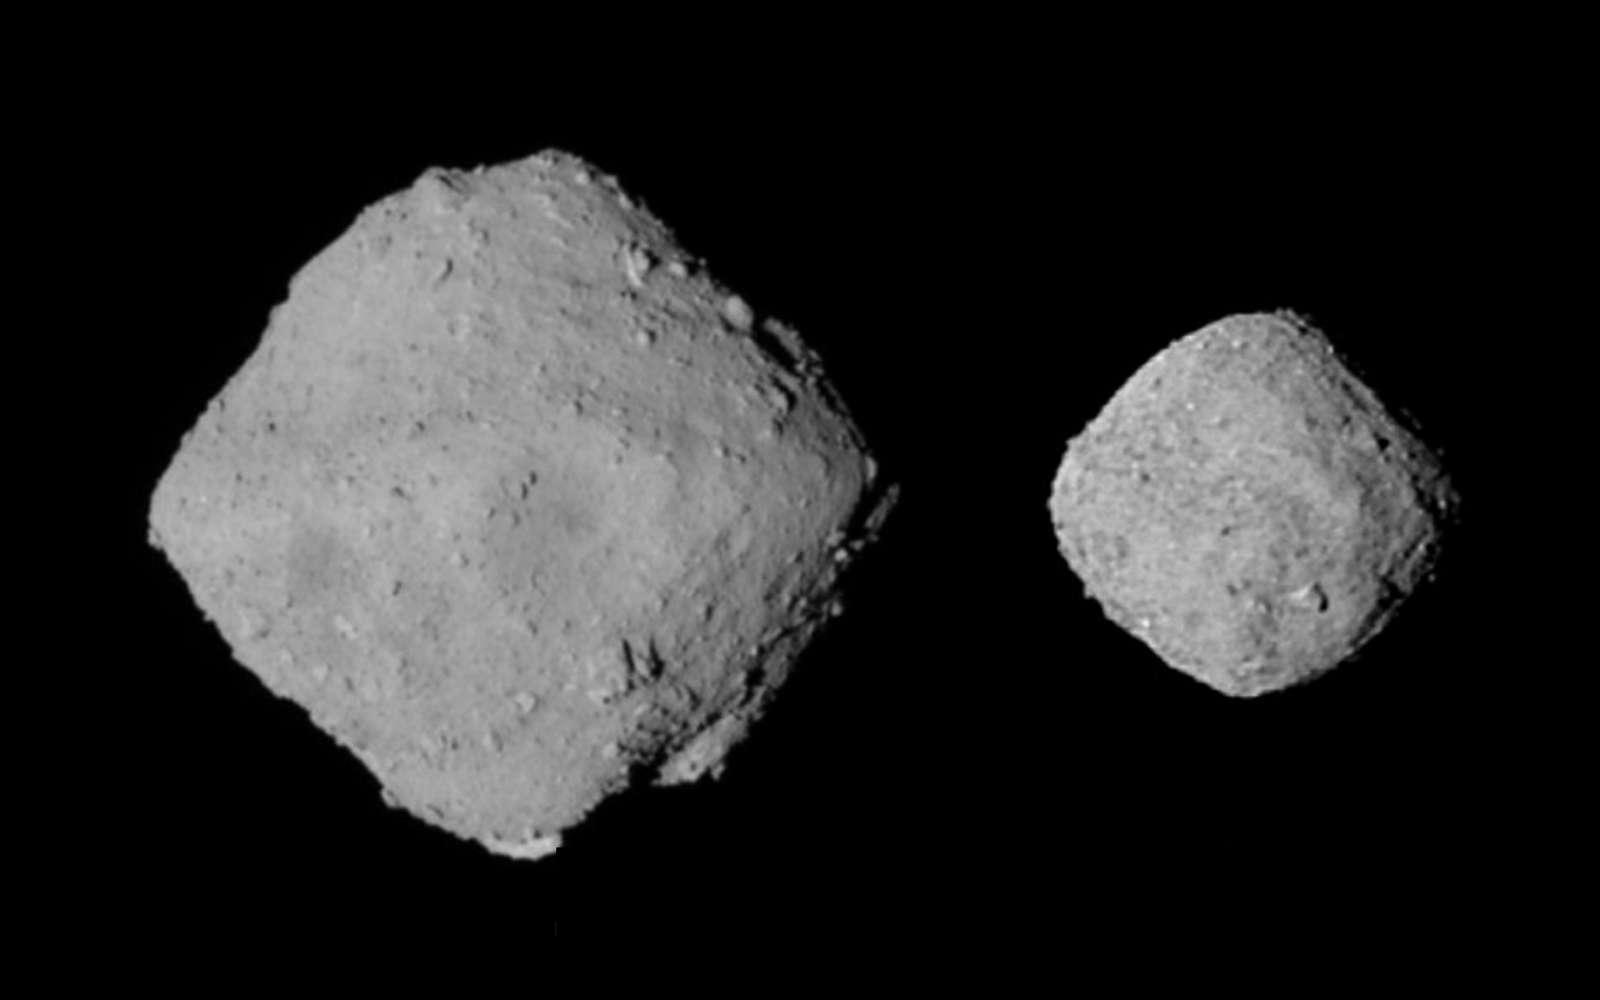 Comparaison de Ryugu (à gauche) avec Bennu (à droite), plus petit. © Jaxa, Nasa, Emily Lakdawalla